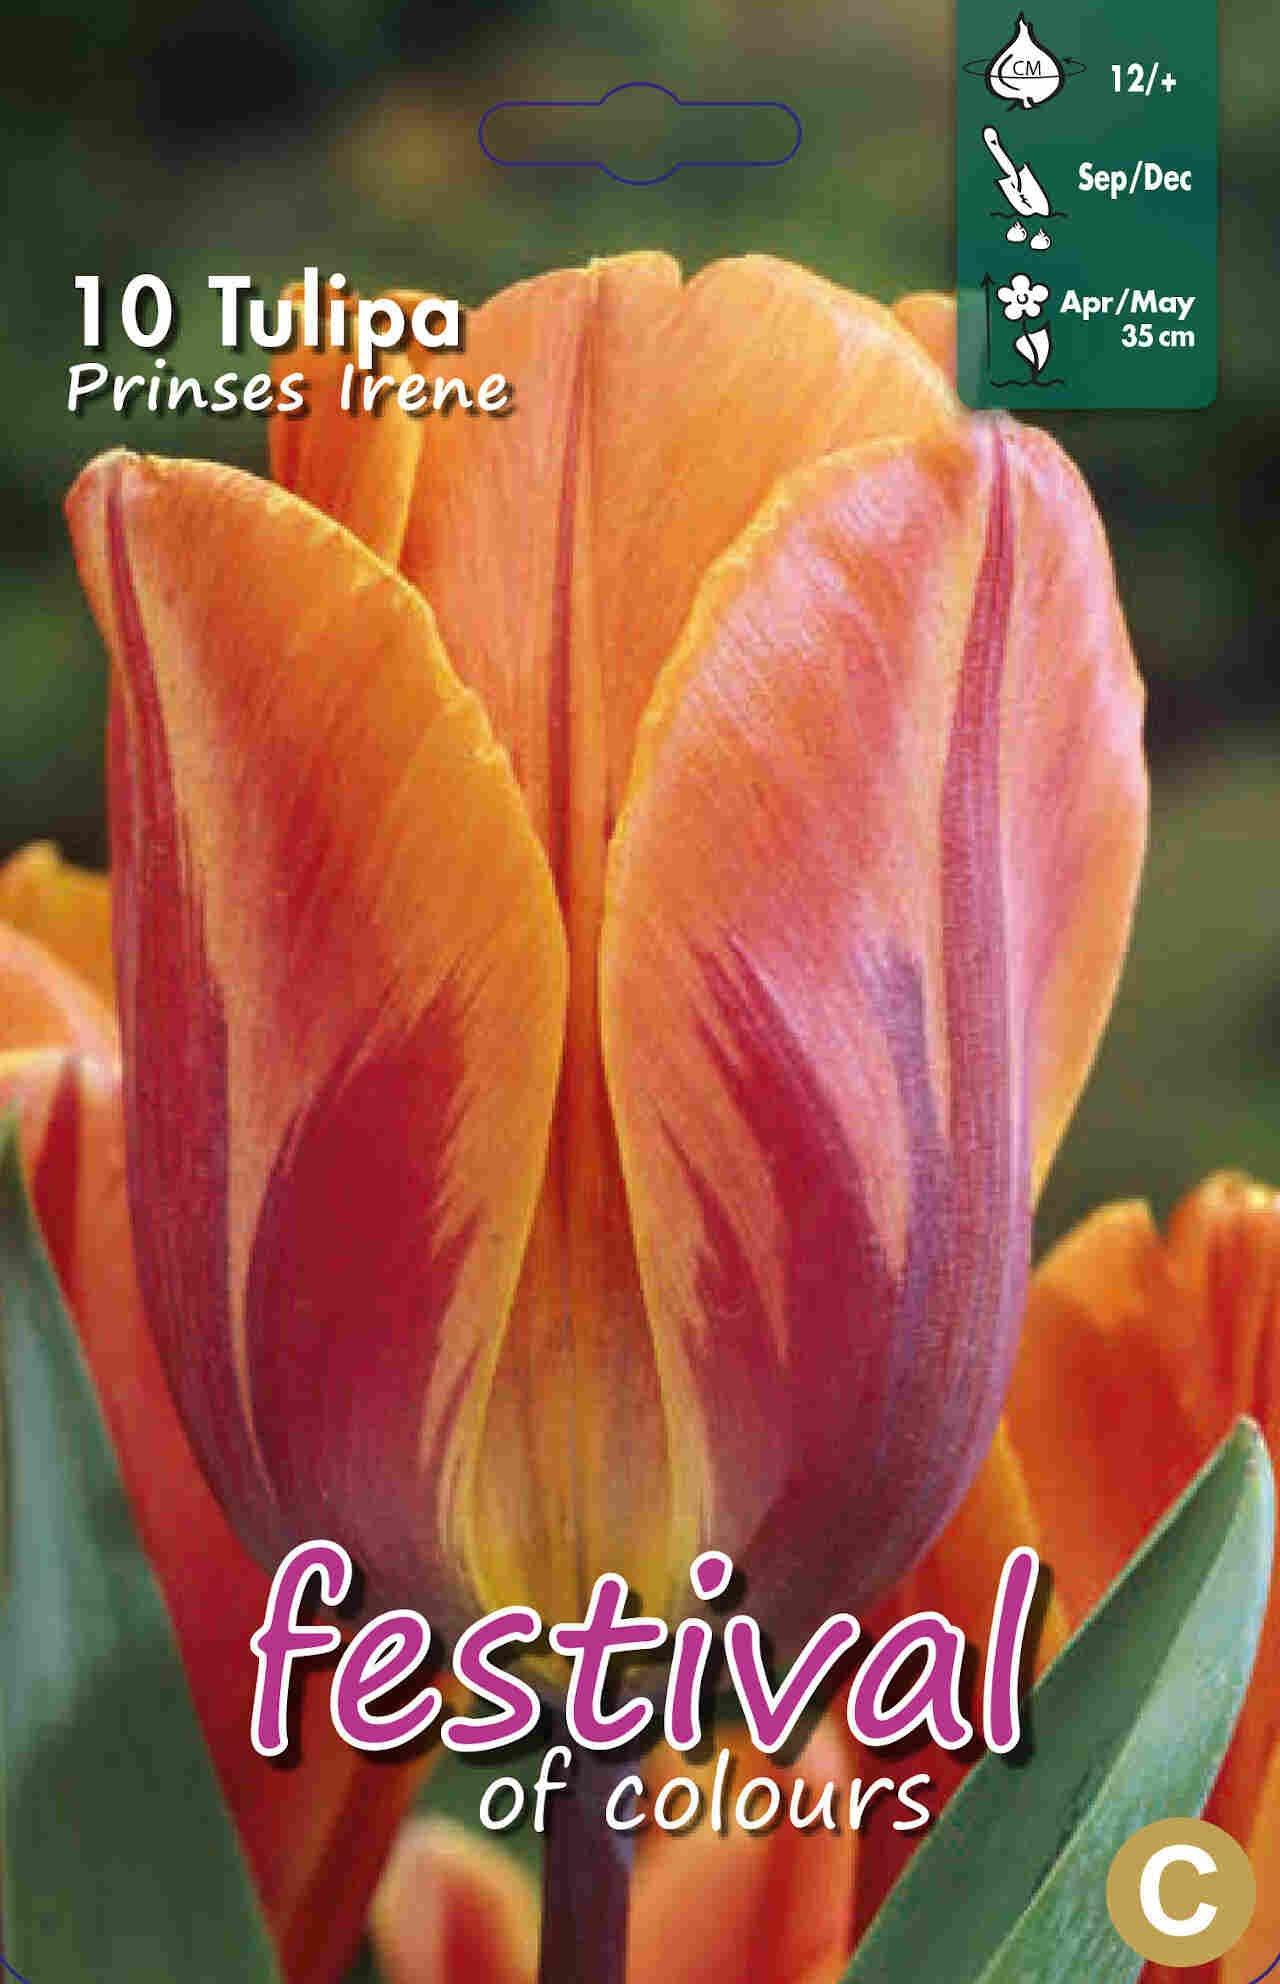 Tulipanløg - Tulipa Prinses Irene 12/+